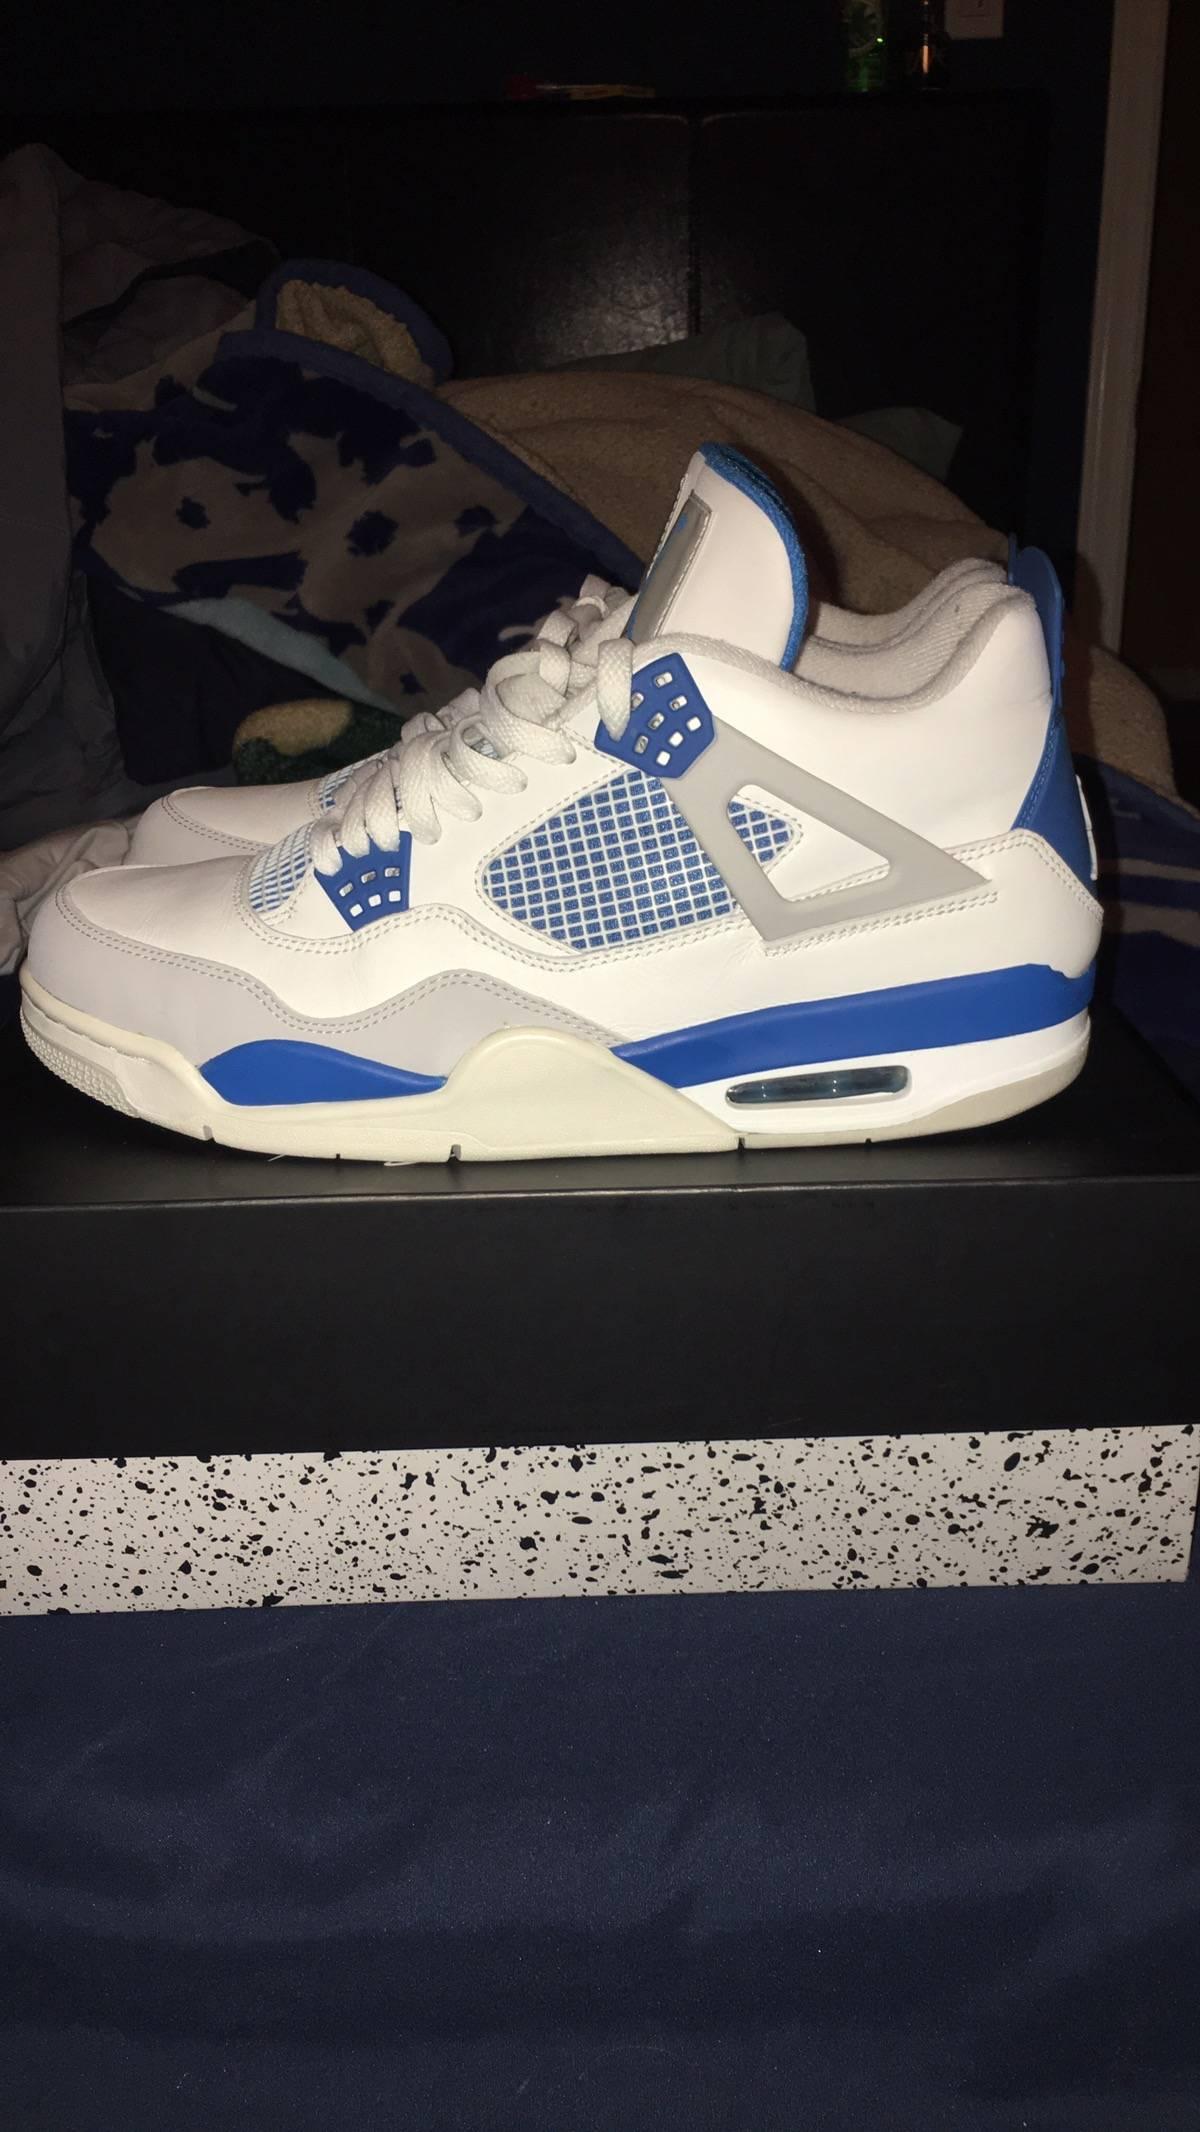 e41080c269eb27 Jordan Brand Military Blue 4s Size 11.5 - Hi-Top Sneakers for Sale - Grailed